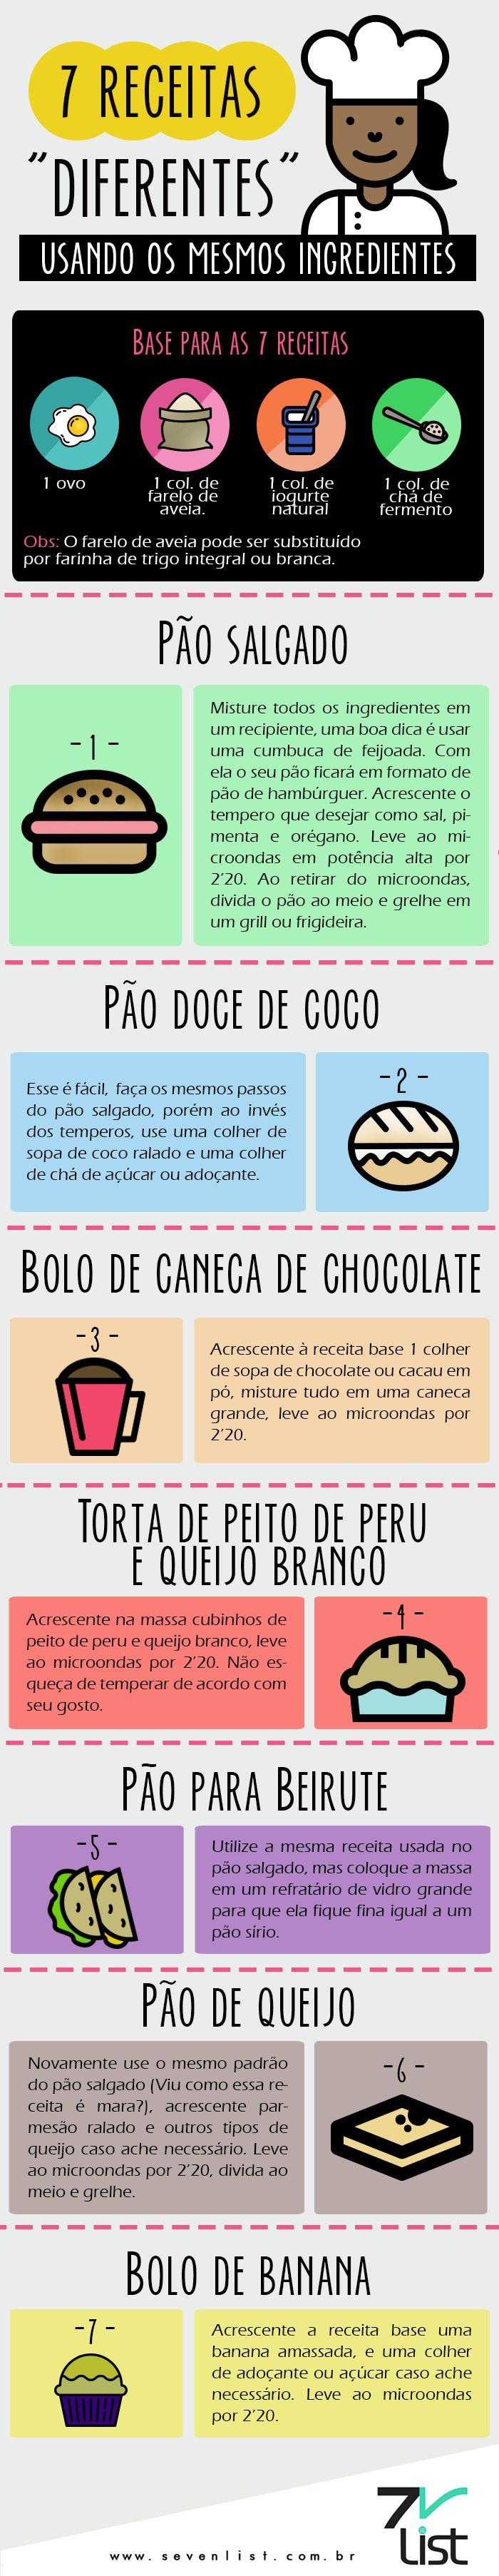 #Design #Infográfico #Receitas #Fit #Basic #Fast #Cake #Bread www.sevenlist.com.br